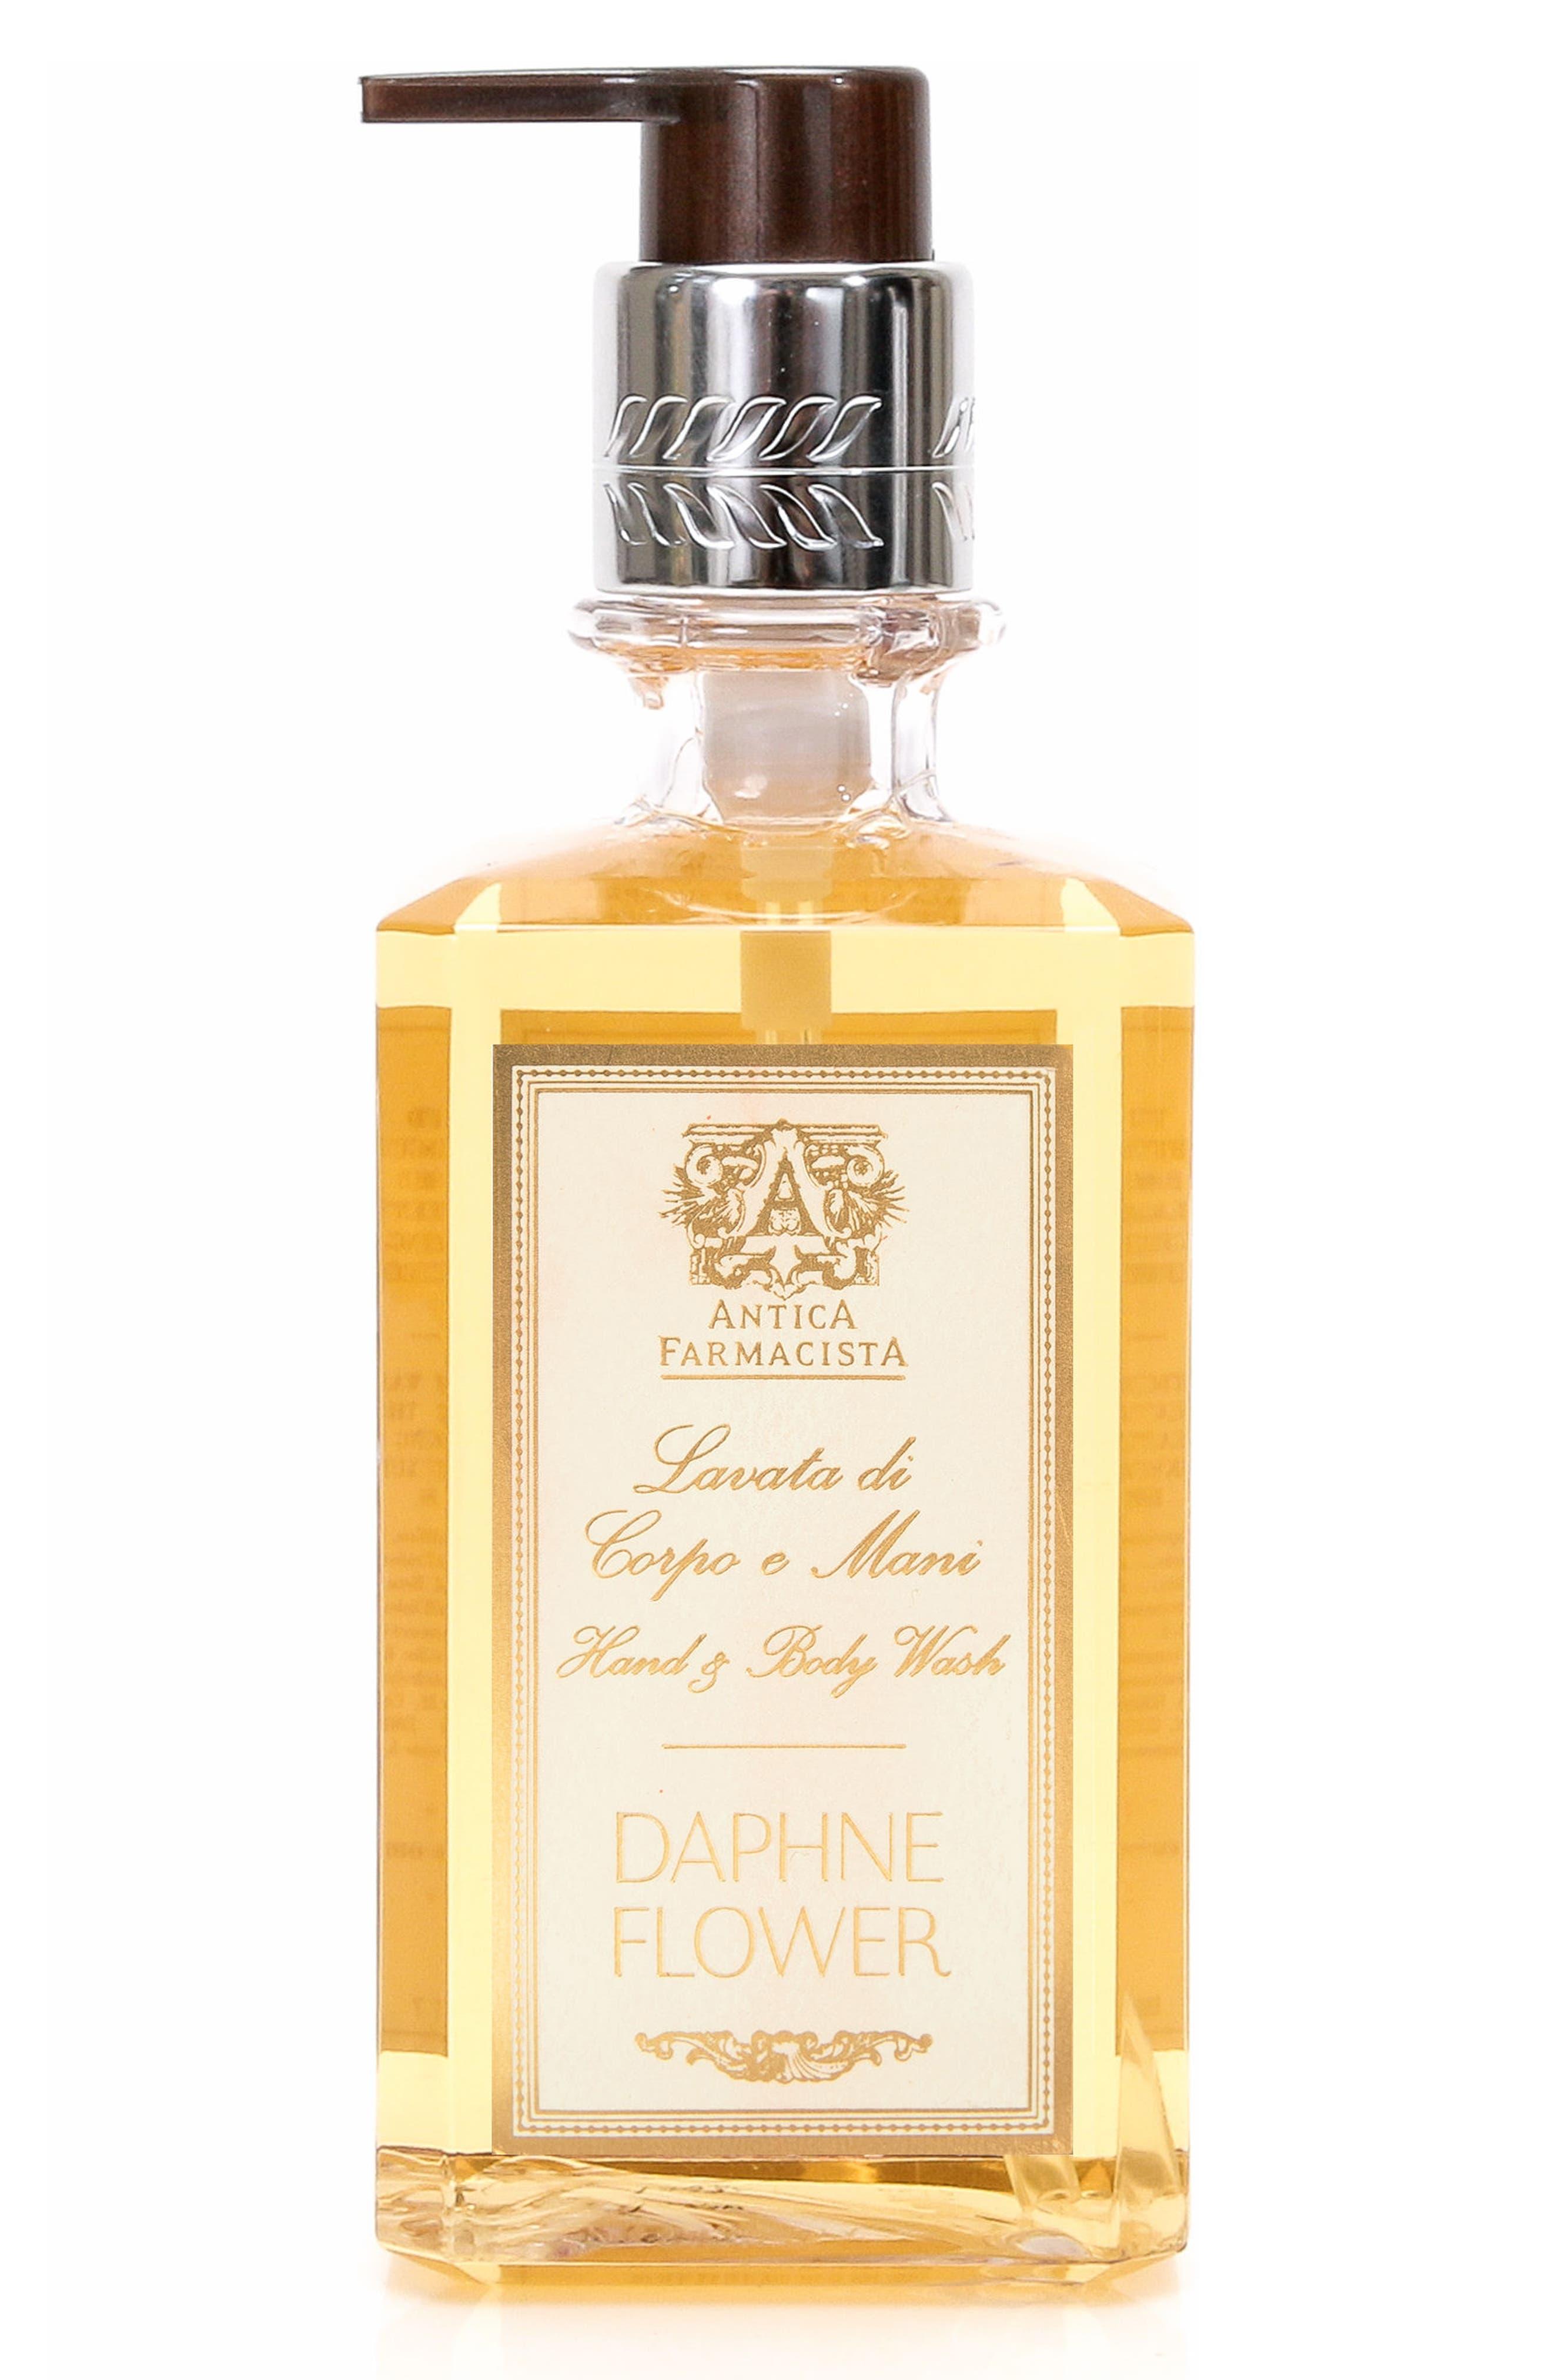 ANTICA FARMACISTA Daphne Flower Hand Wash